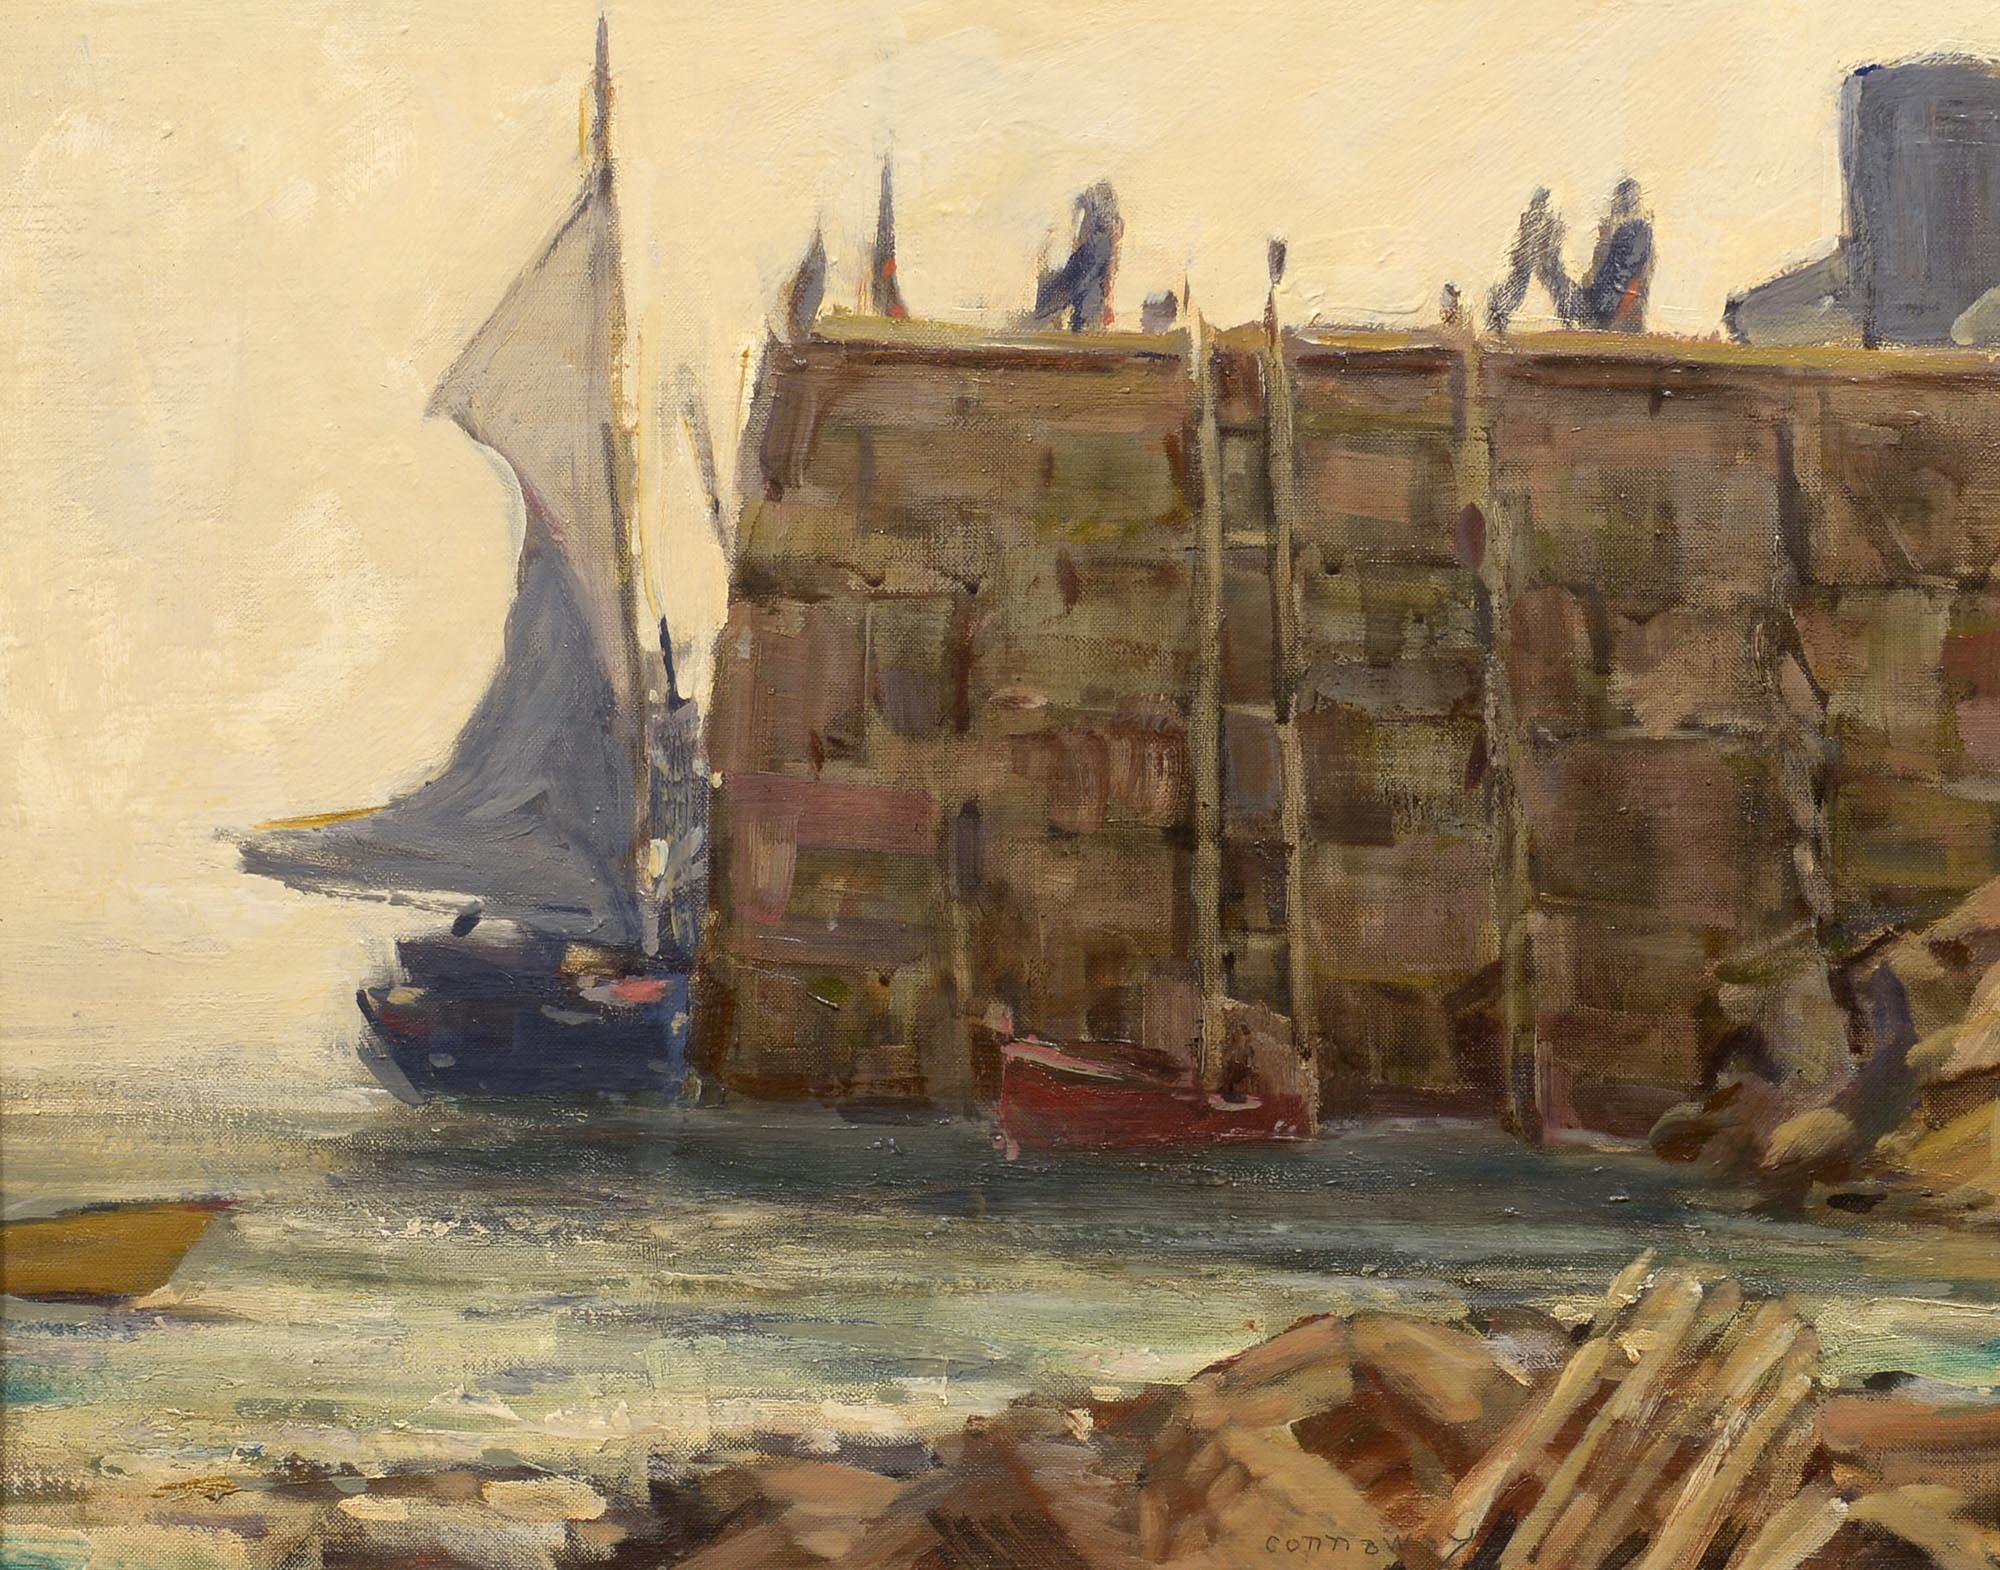 Jay Hall Connaway Monhegan Dock, Low Tide